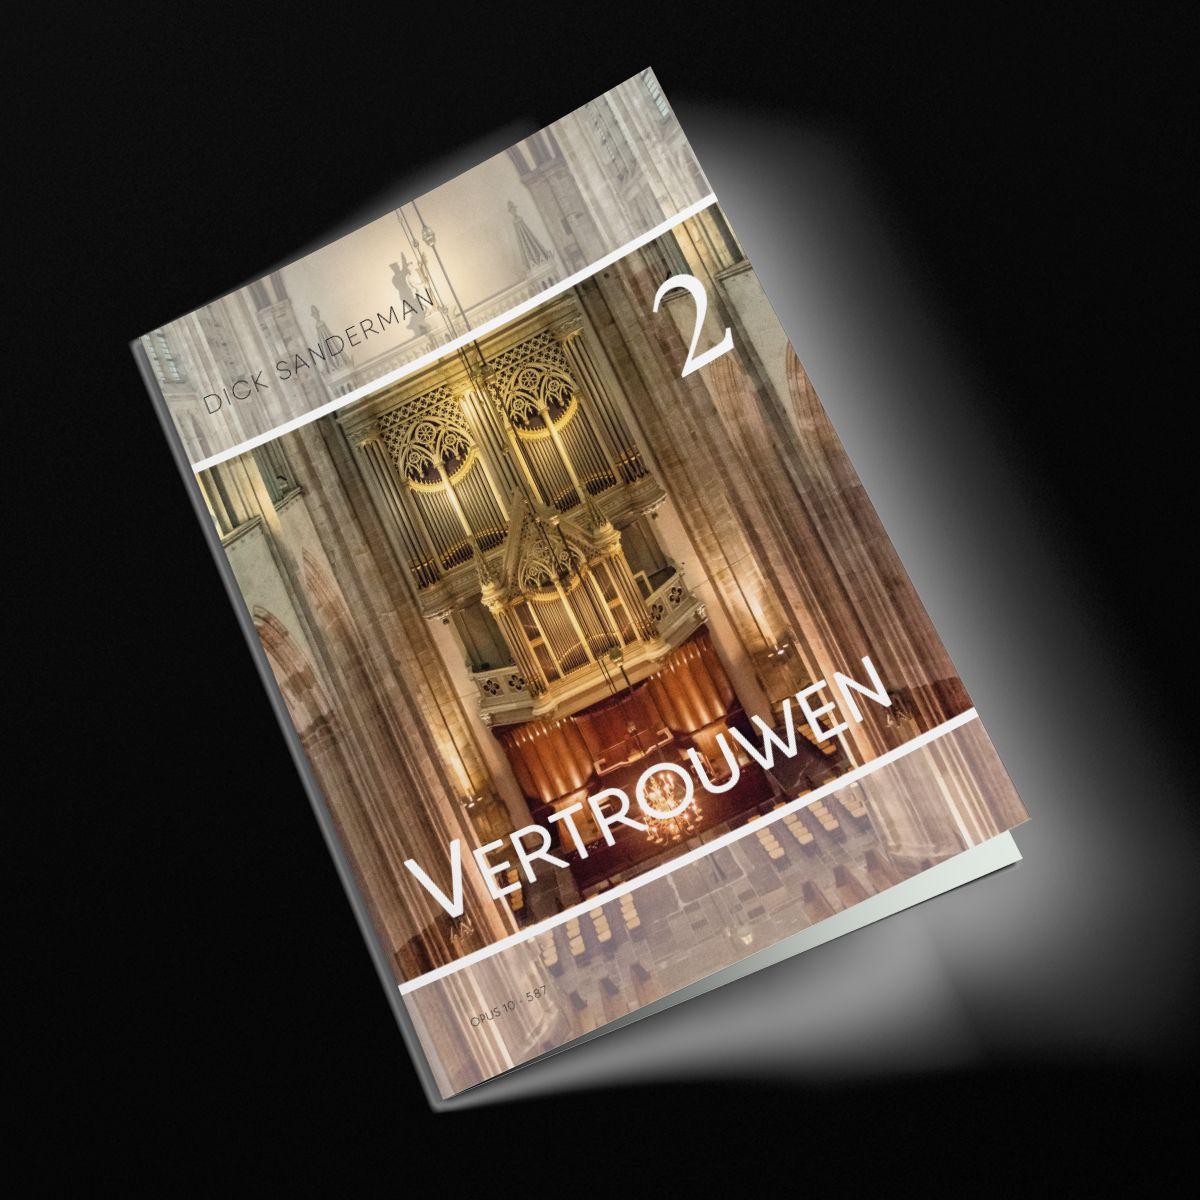 Dick Sanderman: Vertrouwen - Deel 2: Organ: Instrumental Album